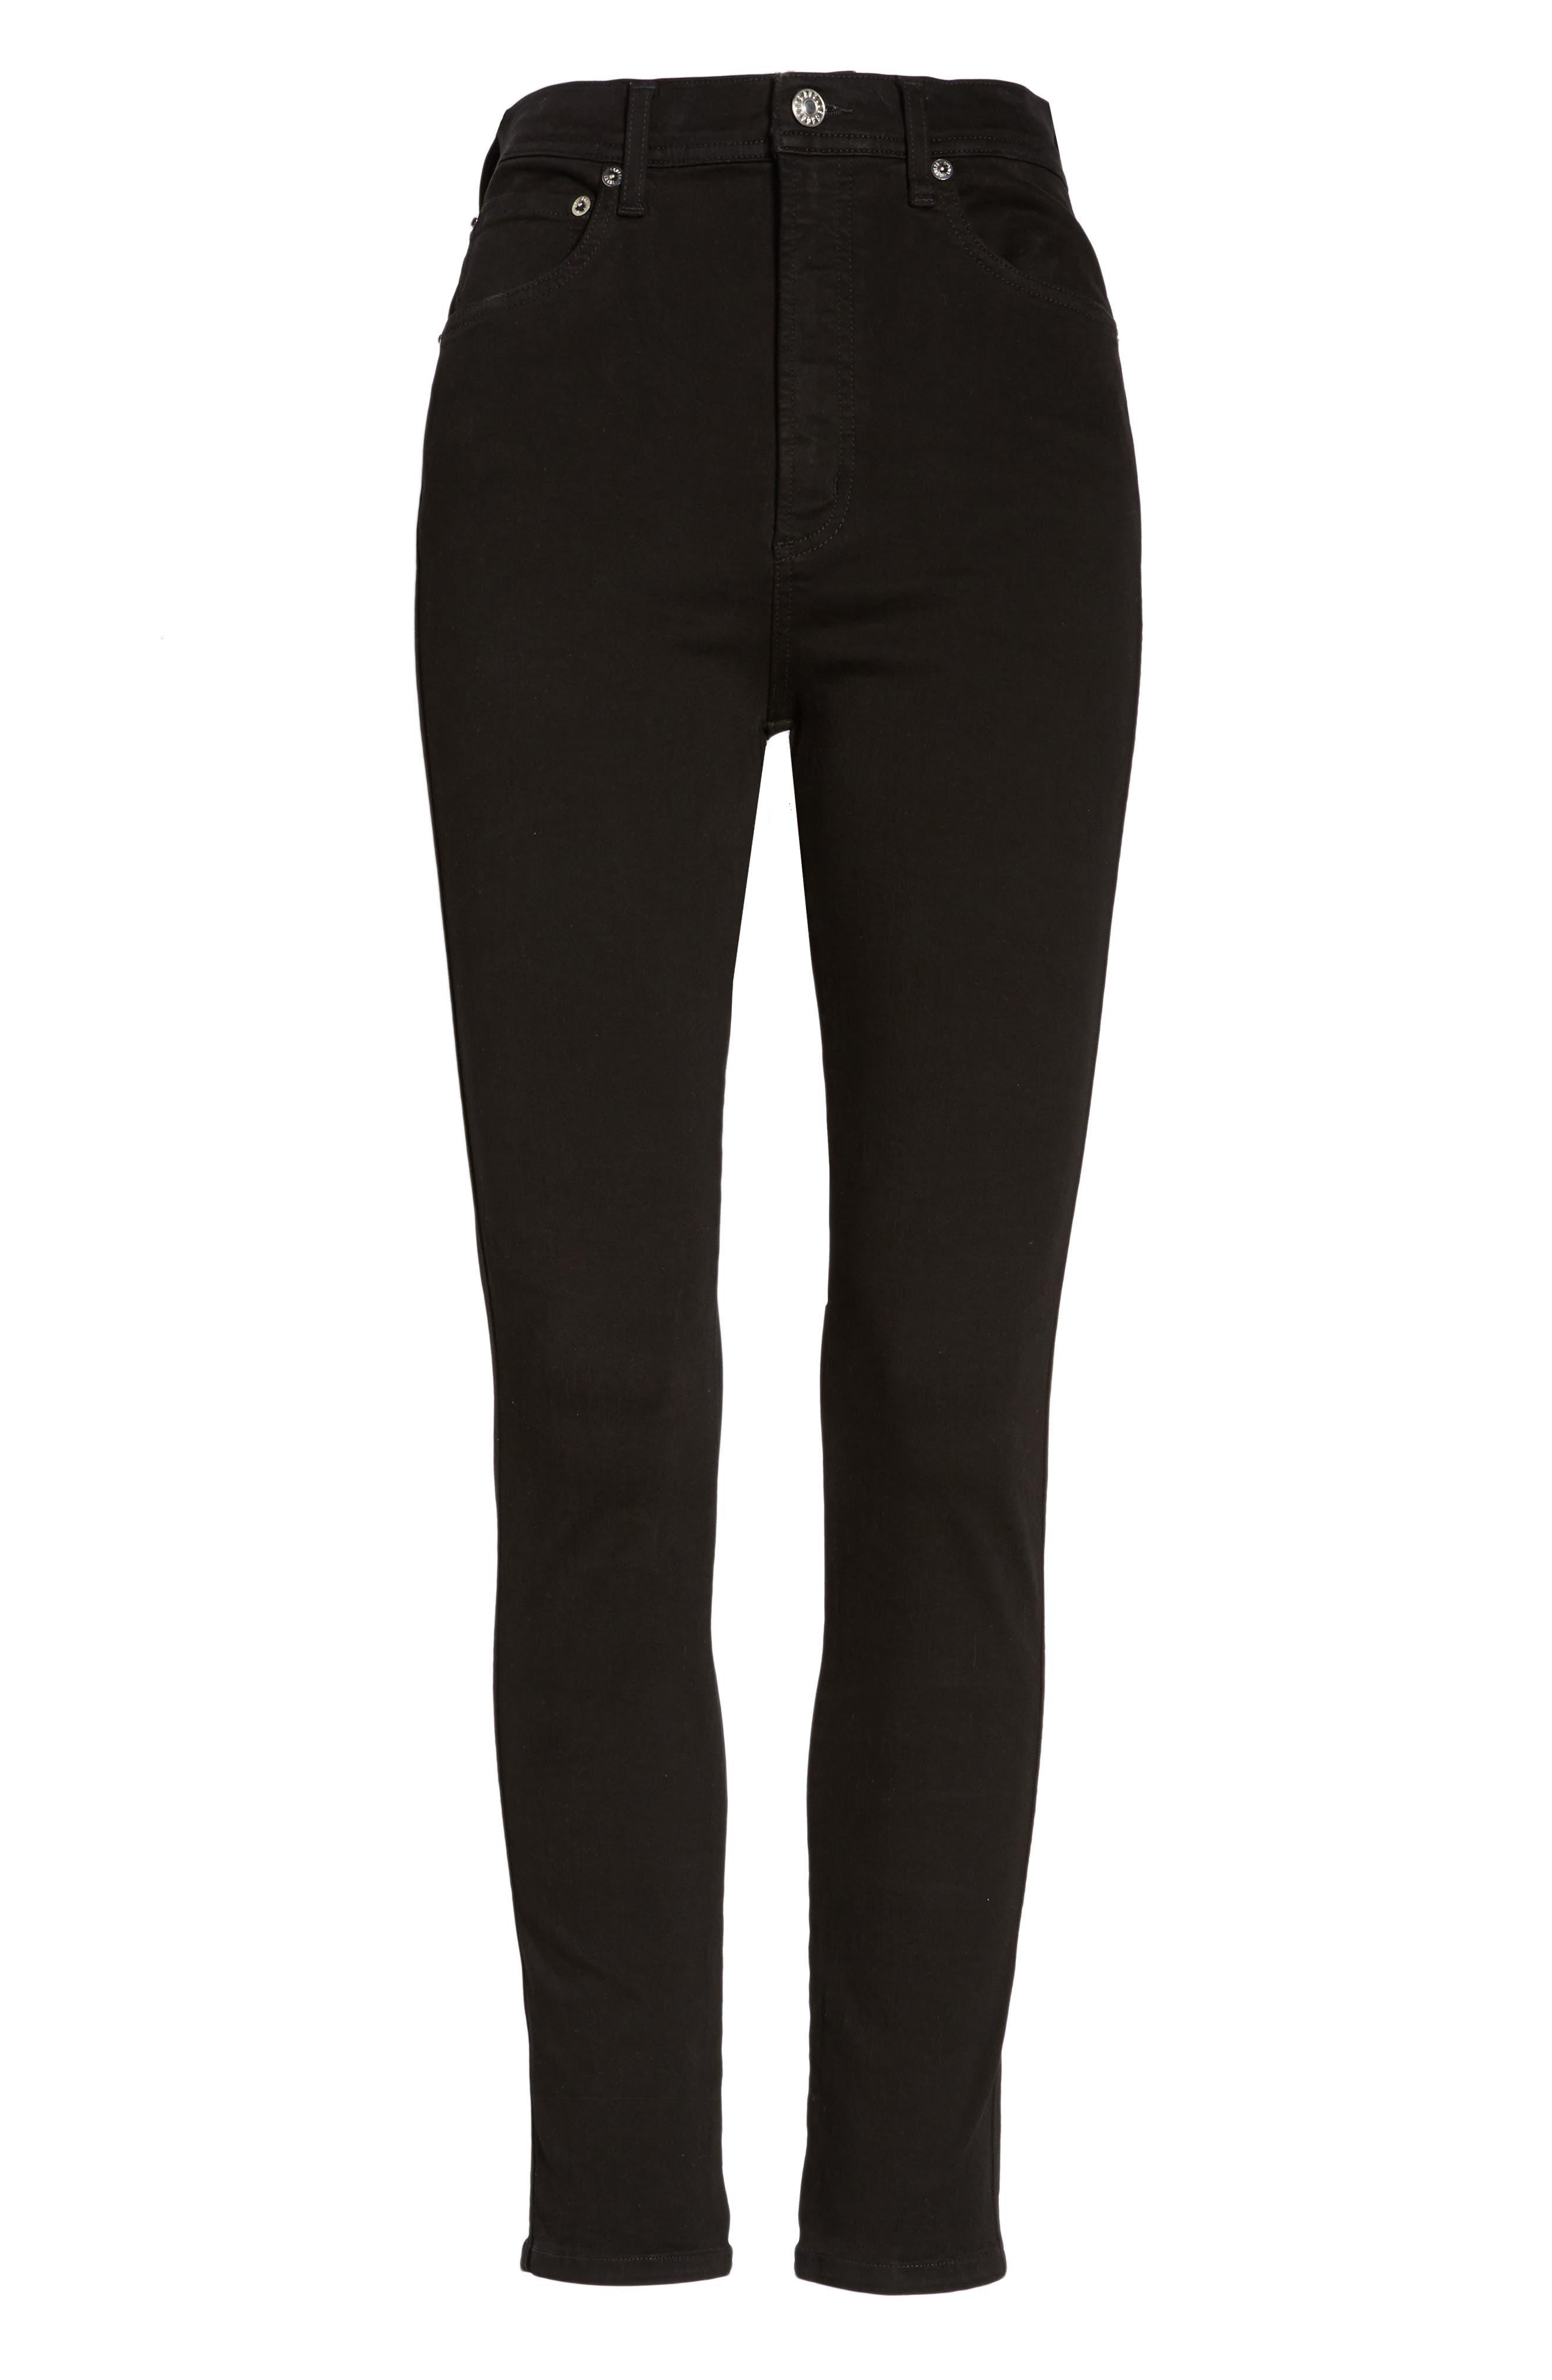 Roxanne Super High Rise Skinny Jeans,                             Alternate thumbnail 7, color,                             Jet